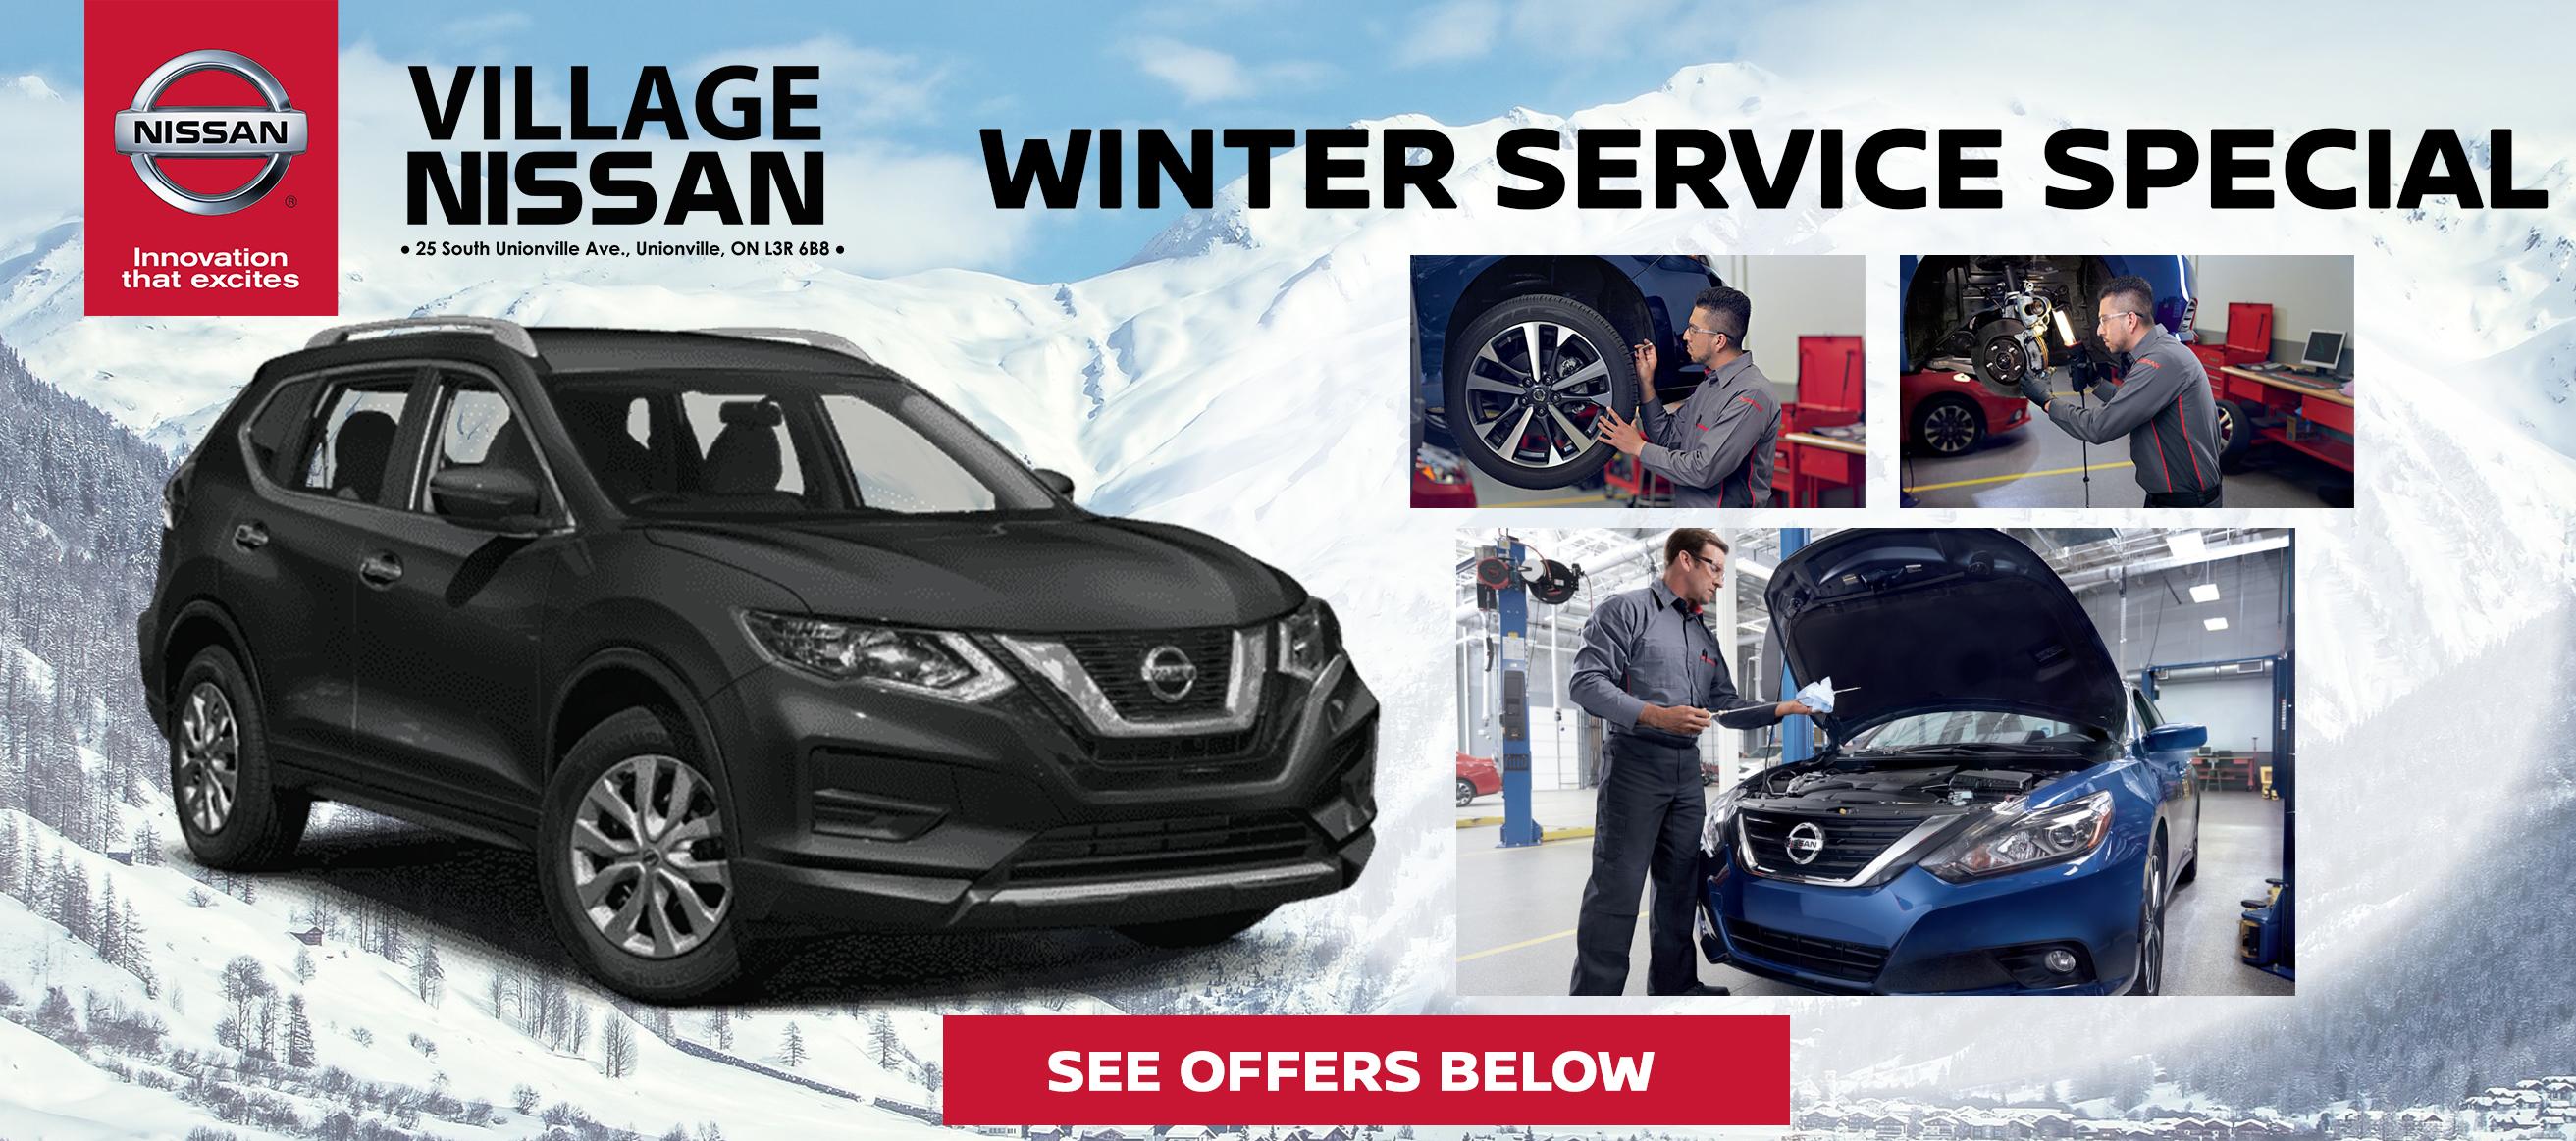 Winter Service Special - Village Nissan